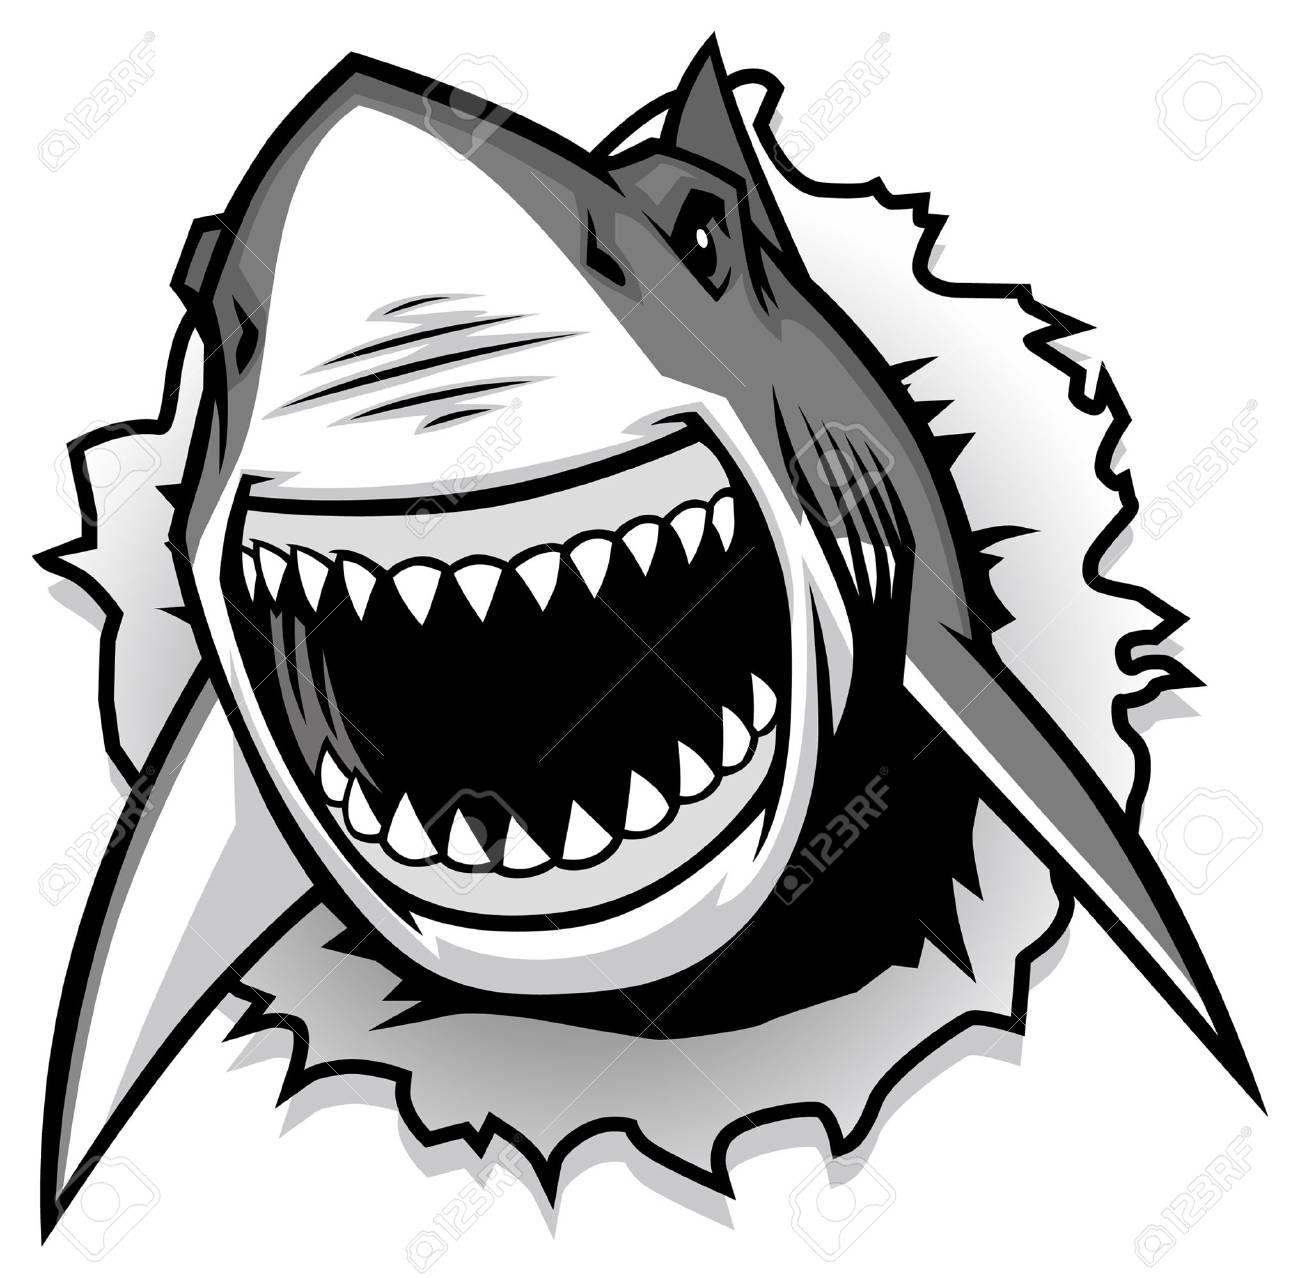 Great White Shark Illustration Ad White Great Illustration Shark Ilustracao Tubarao Arte De Tubarao Tubarao Branco